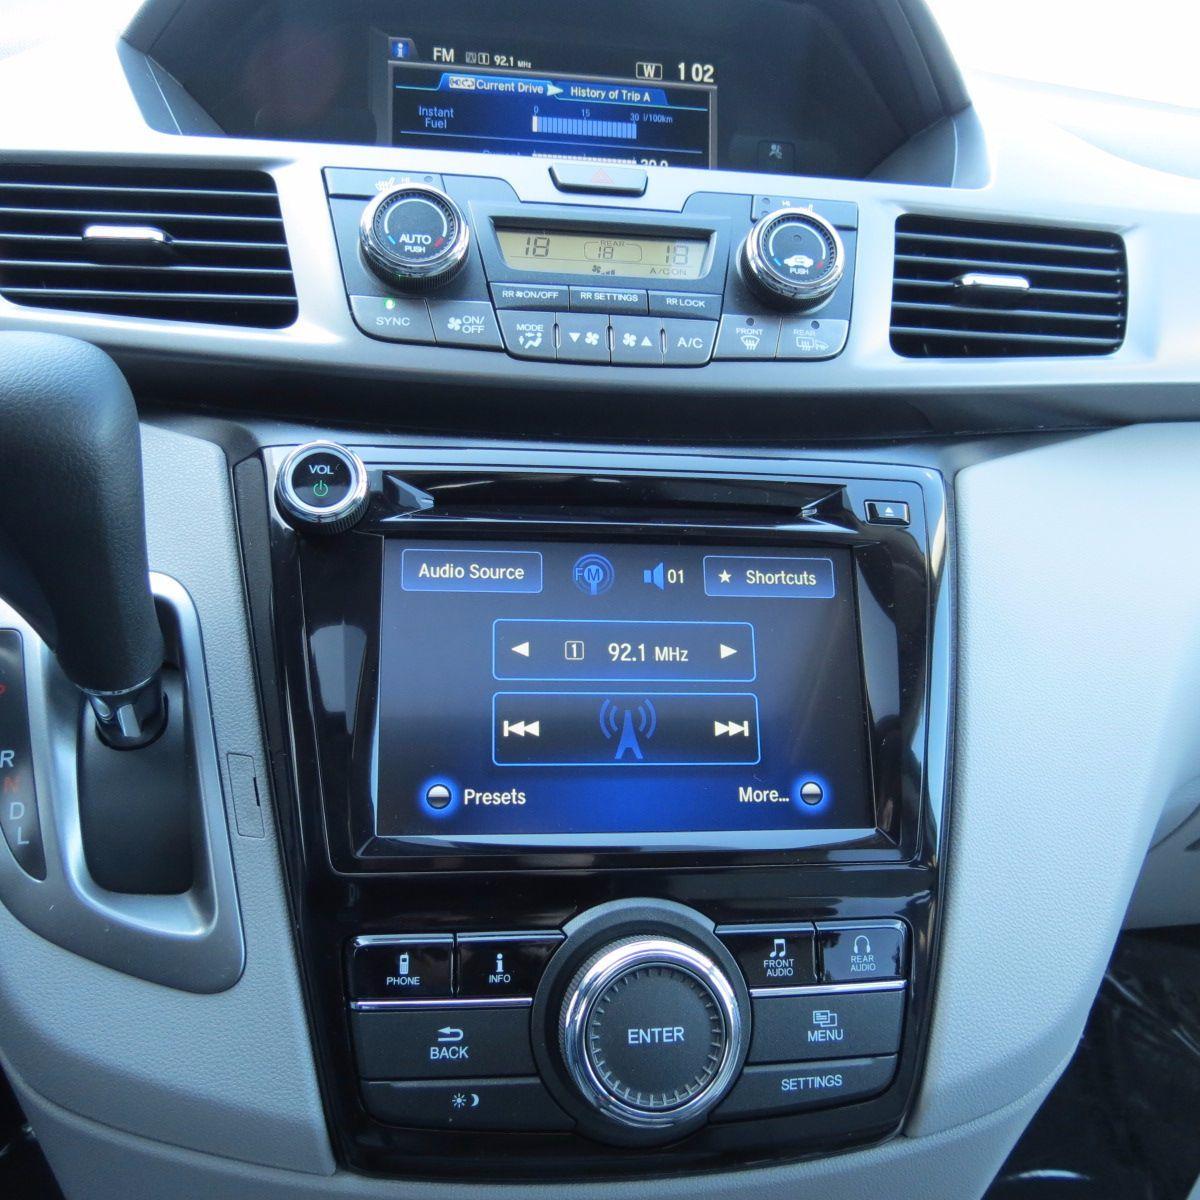 Honda Mini Vans: New 2017 Honda Odyssey EX-L 3.5L 6 CYL AUTOMATIC FWD